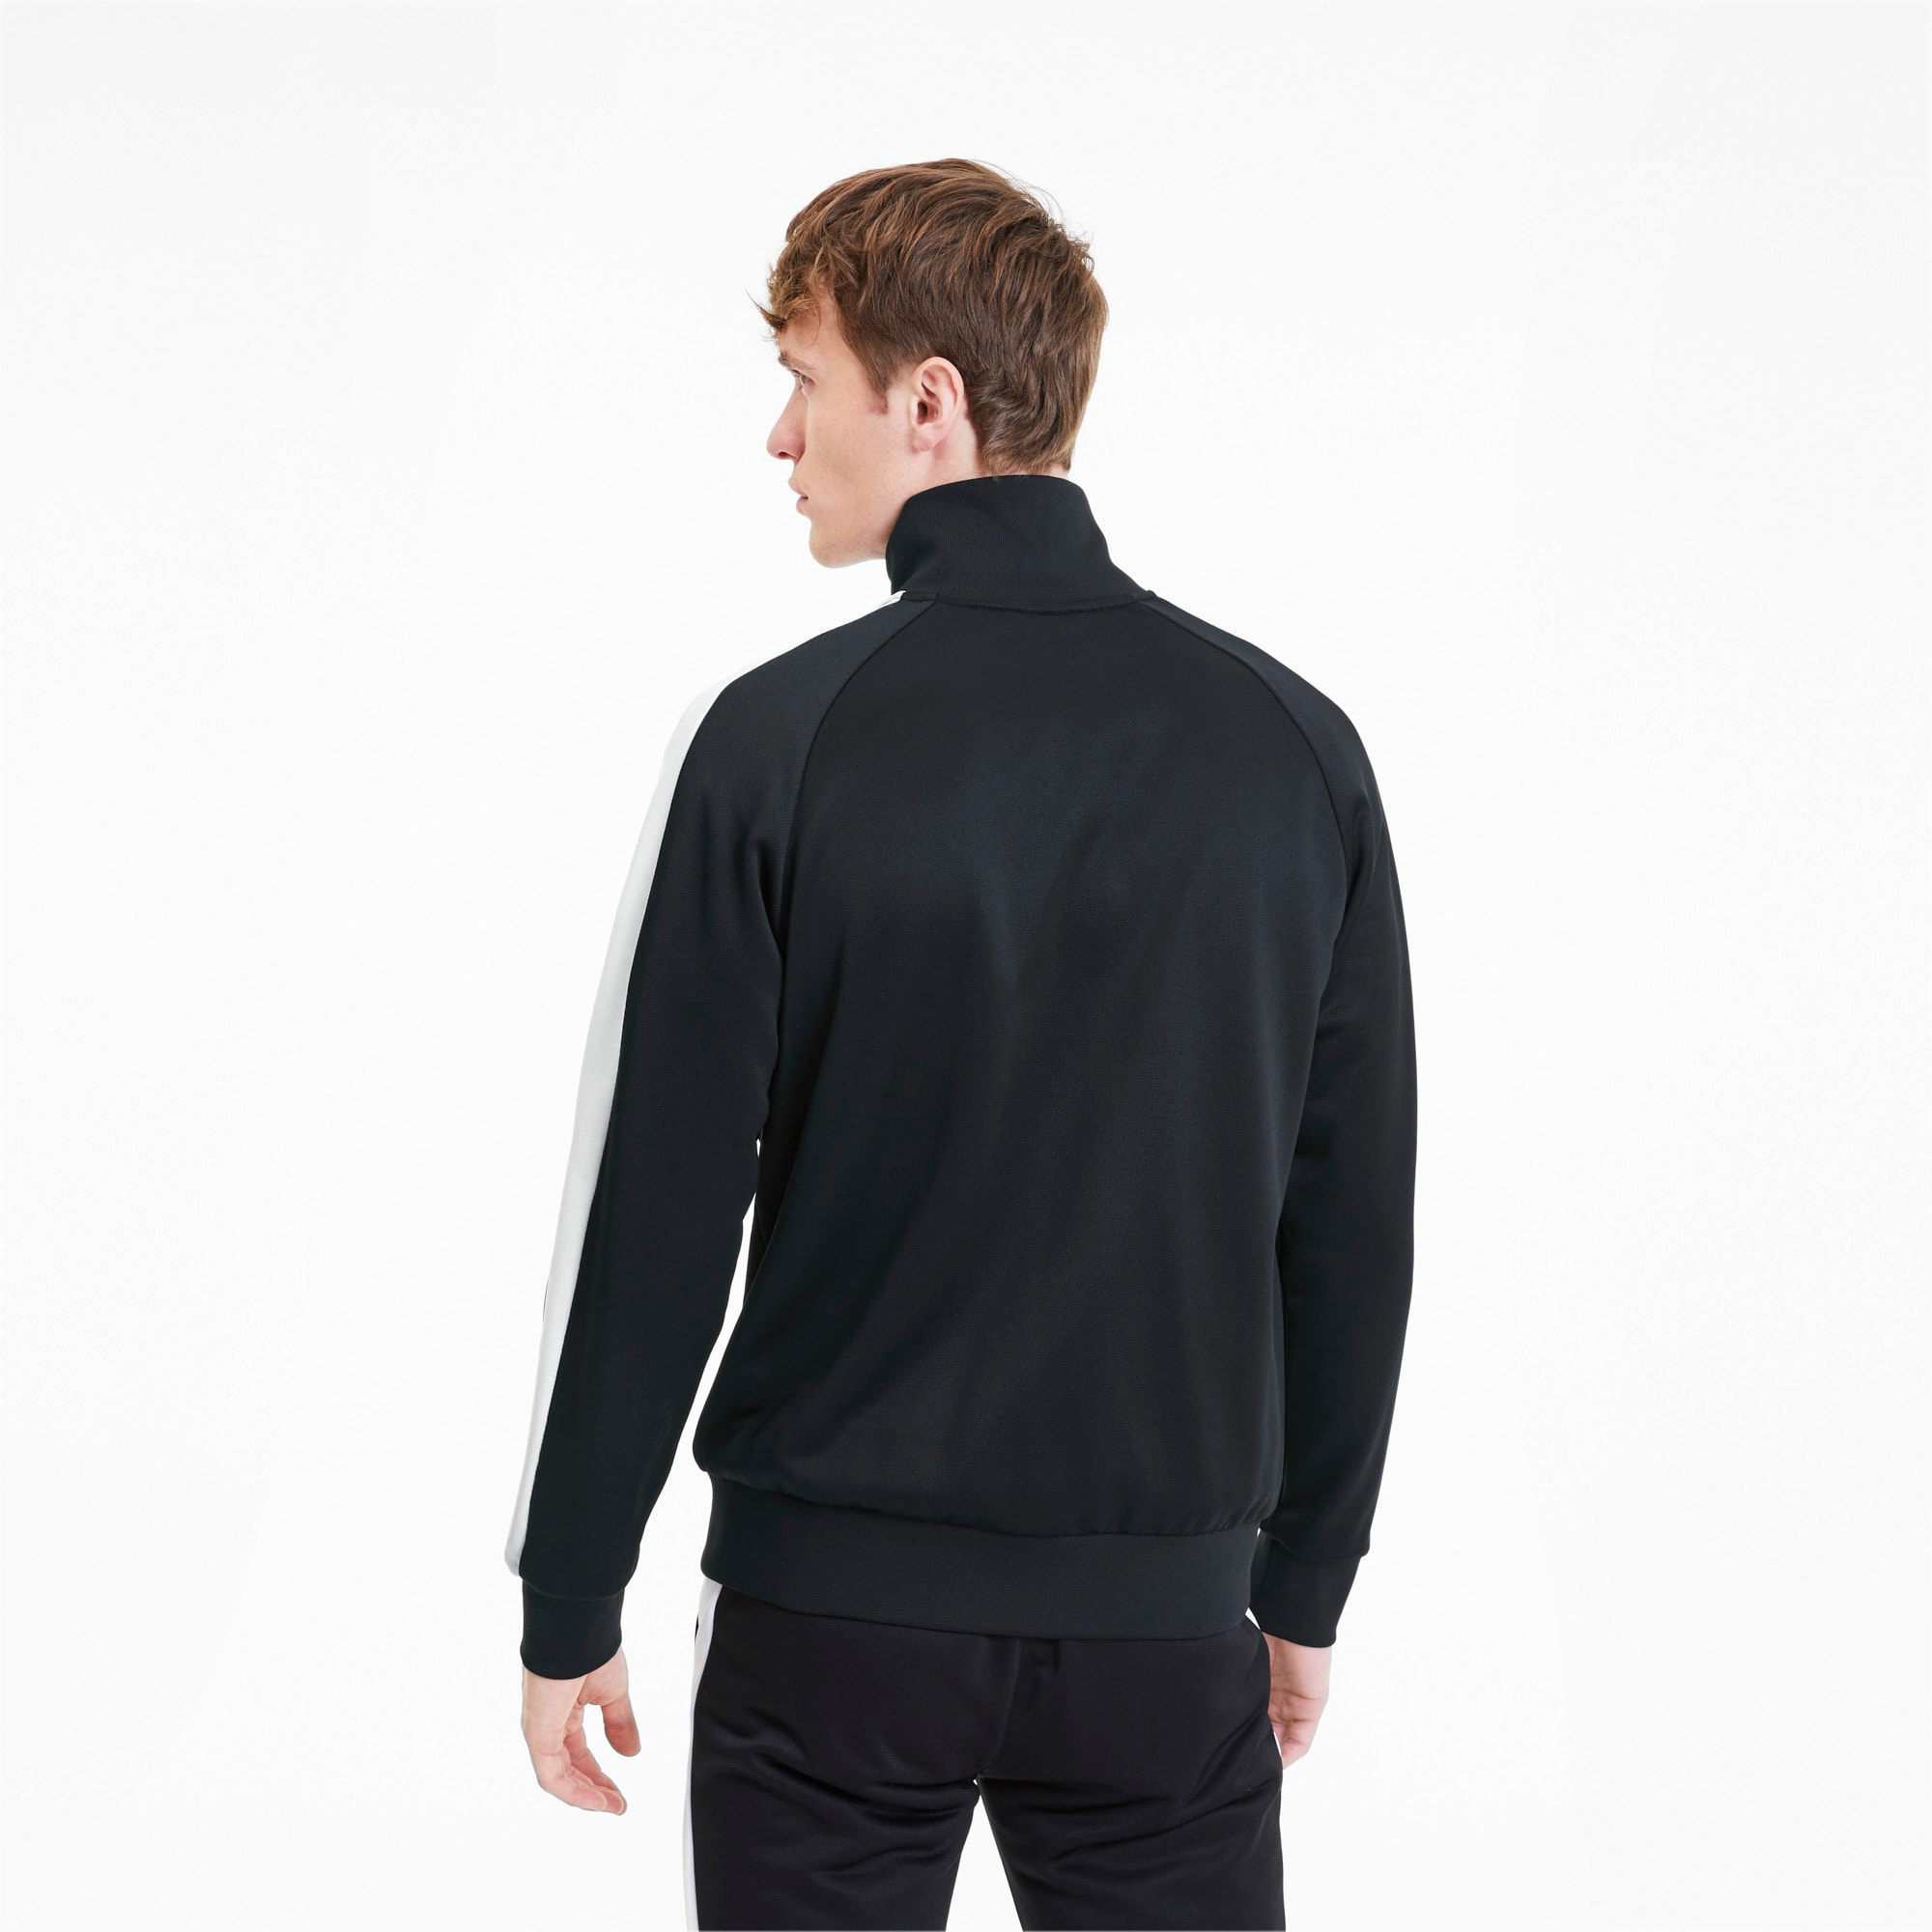 Thumbnail 2 of Iconic T7 Men's Track Jacket, Puma Black, medium